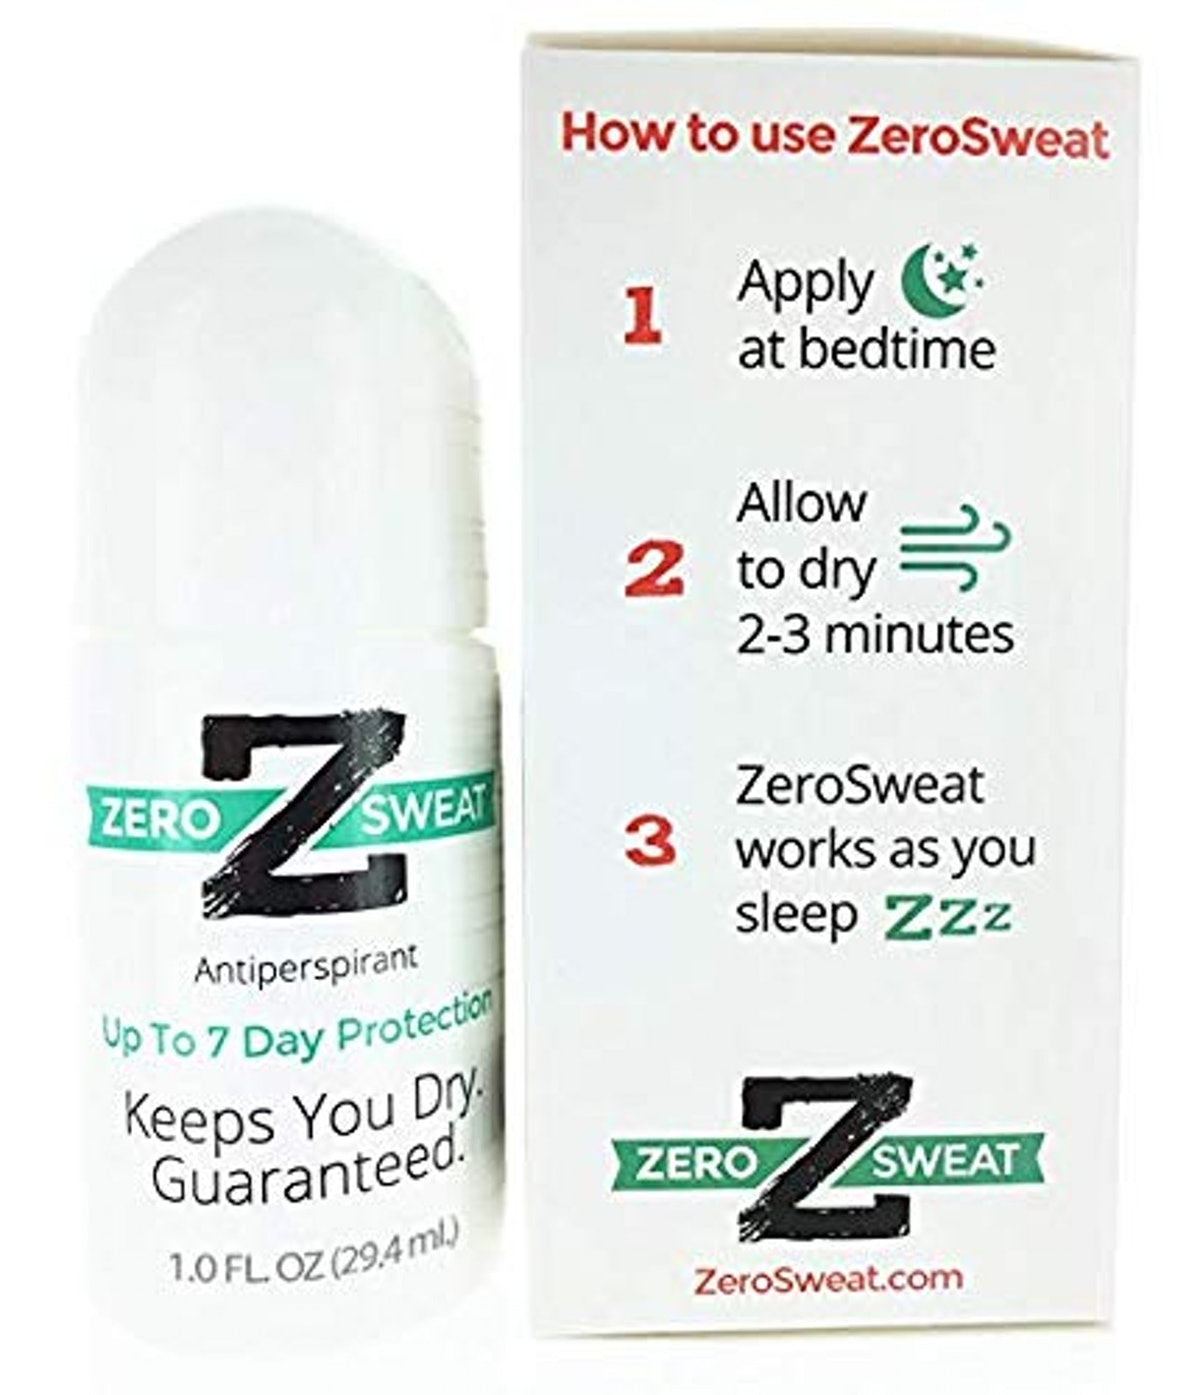 ZeroSweat Antiperspirant Deodorant